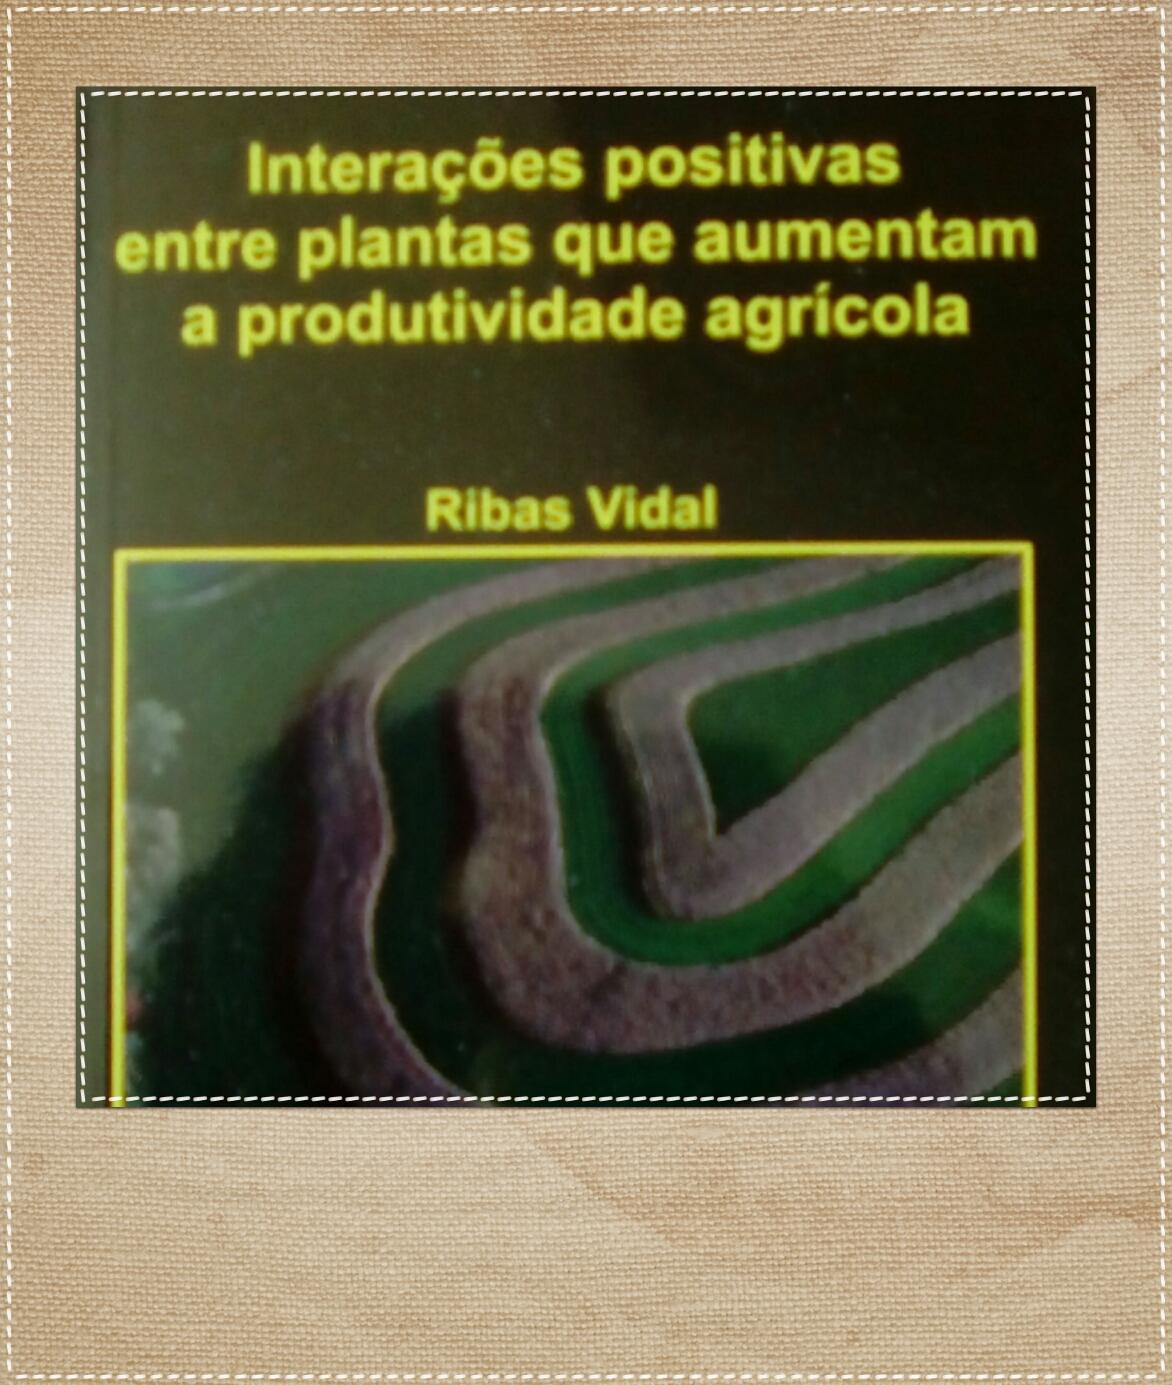 Referncias do livro interaes positivas entre plantas fandeluxe Images